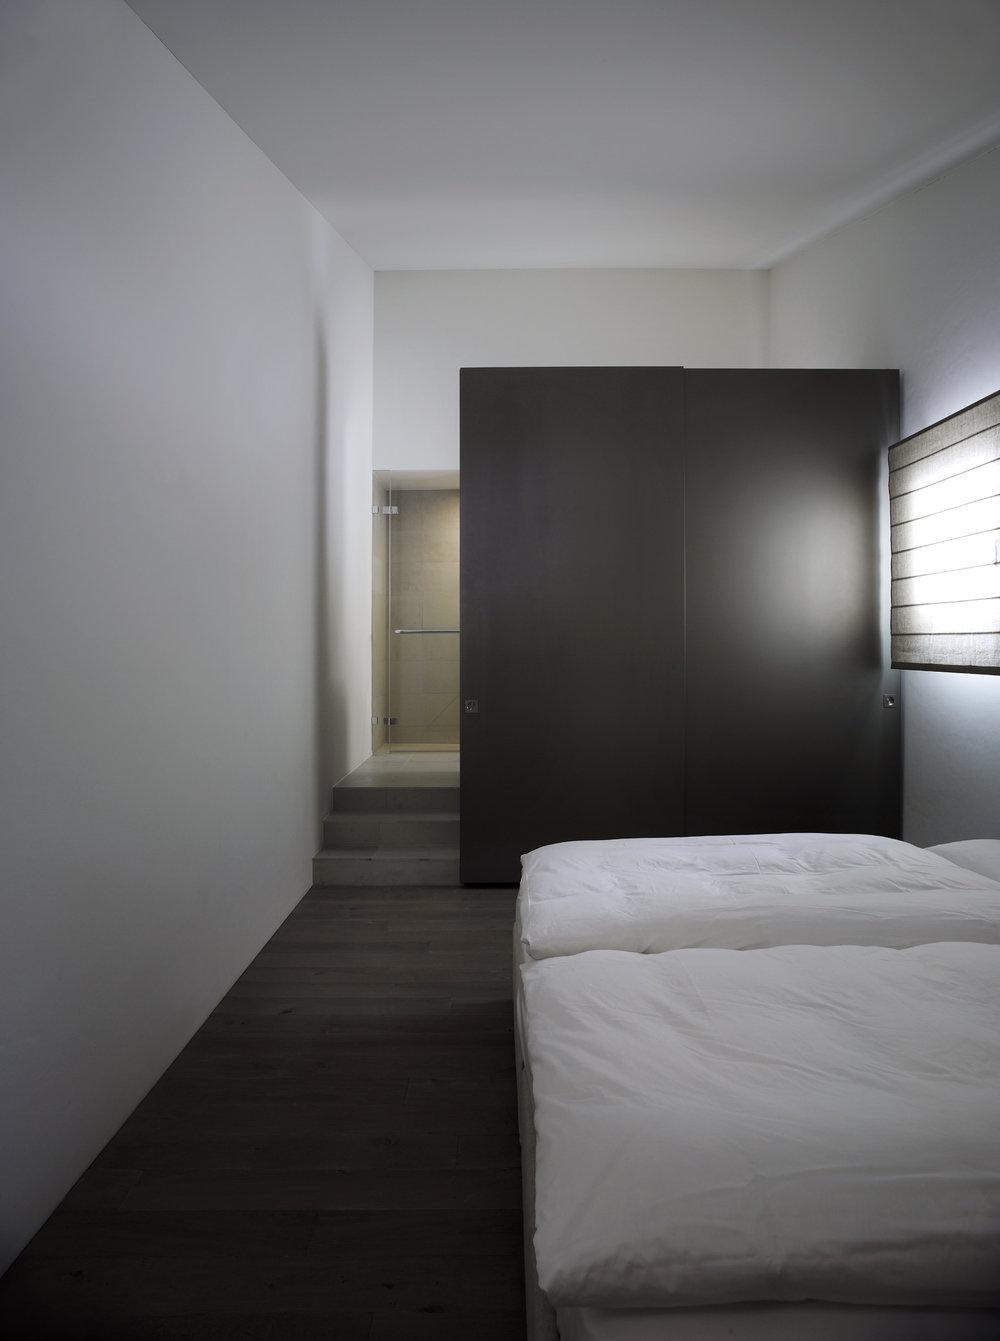 031_iria_degen_interiors_apartment_house_engadin4.jpg